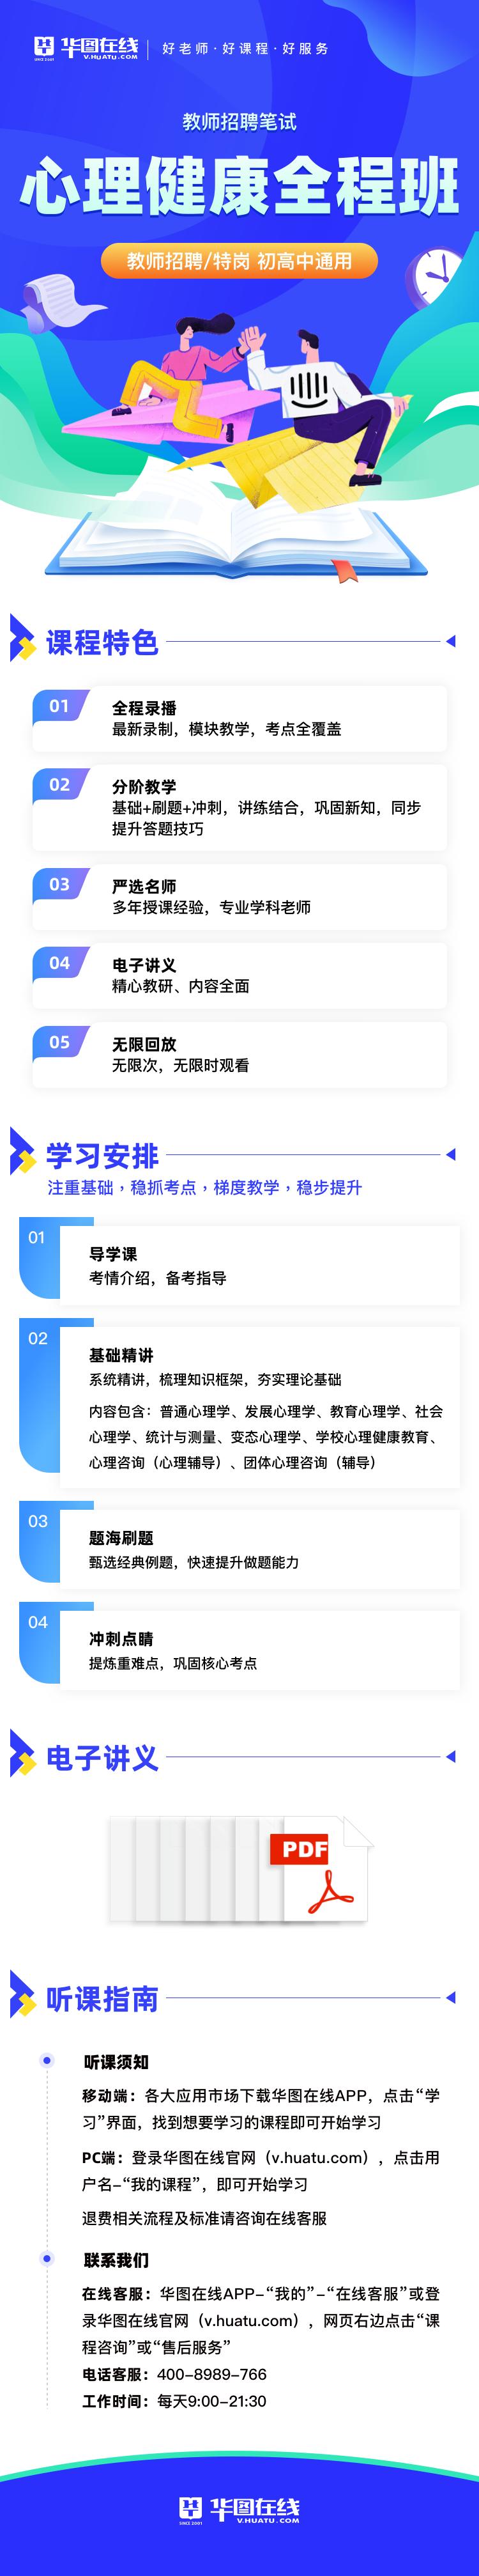 http://upload.htexam.com/userimg/1594797792.png